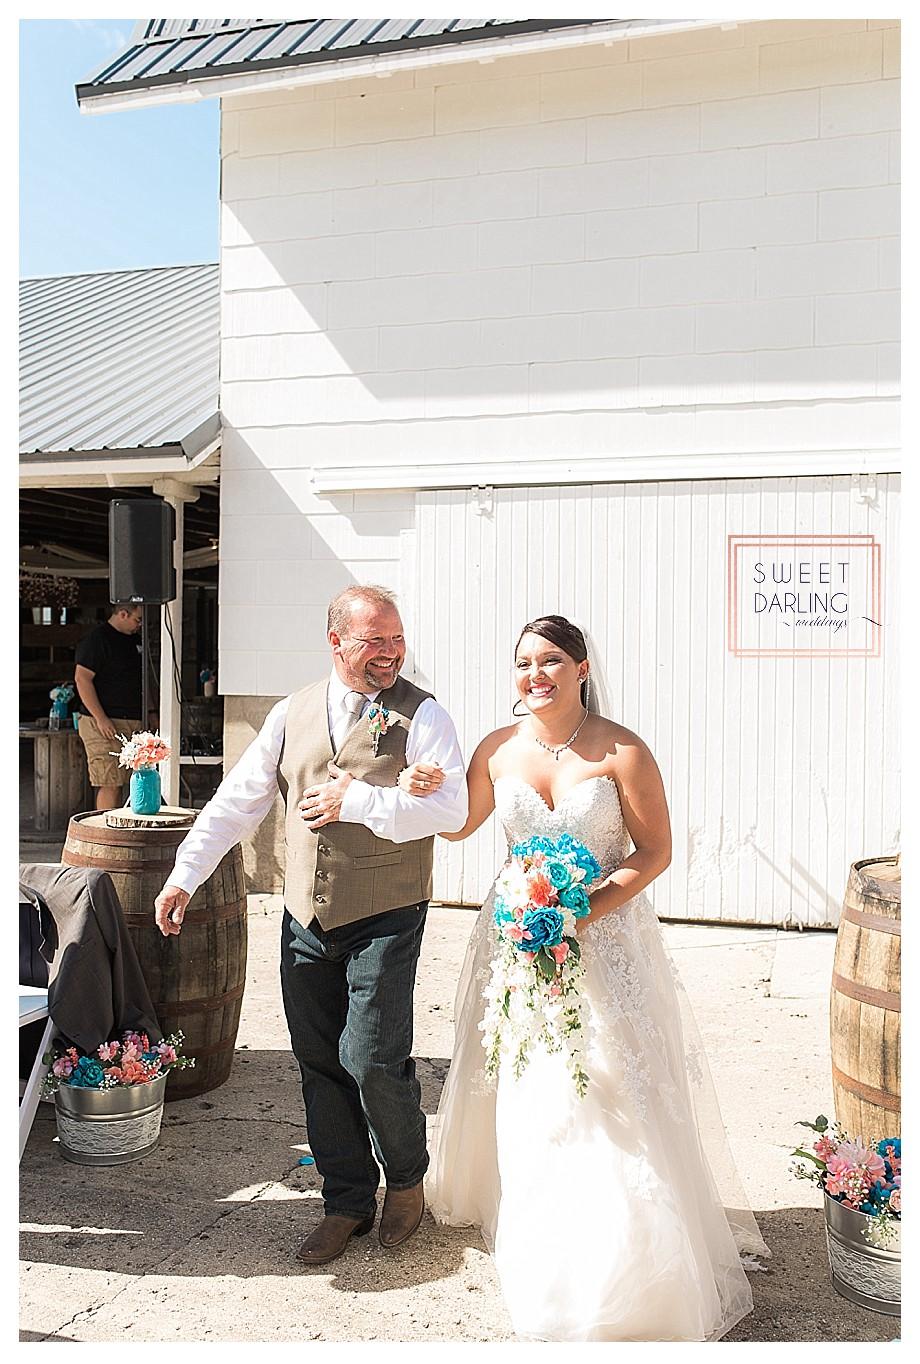 wedding-barn-farm-horses-sparkler-exit-Engelbrecht-Farm-Paxton-Illinois-Sweet-Darling-Weddings-Photographer_0470